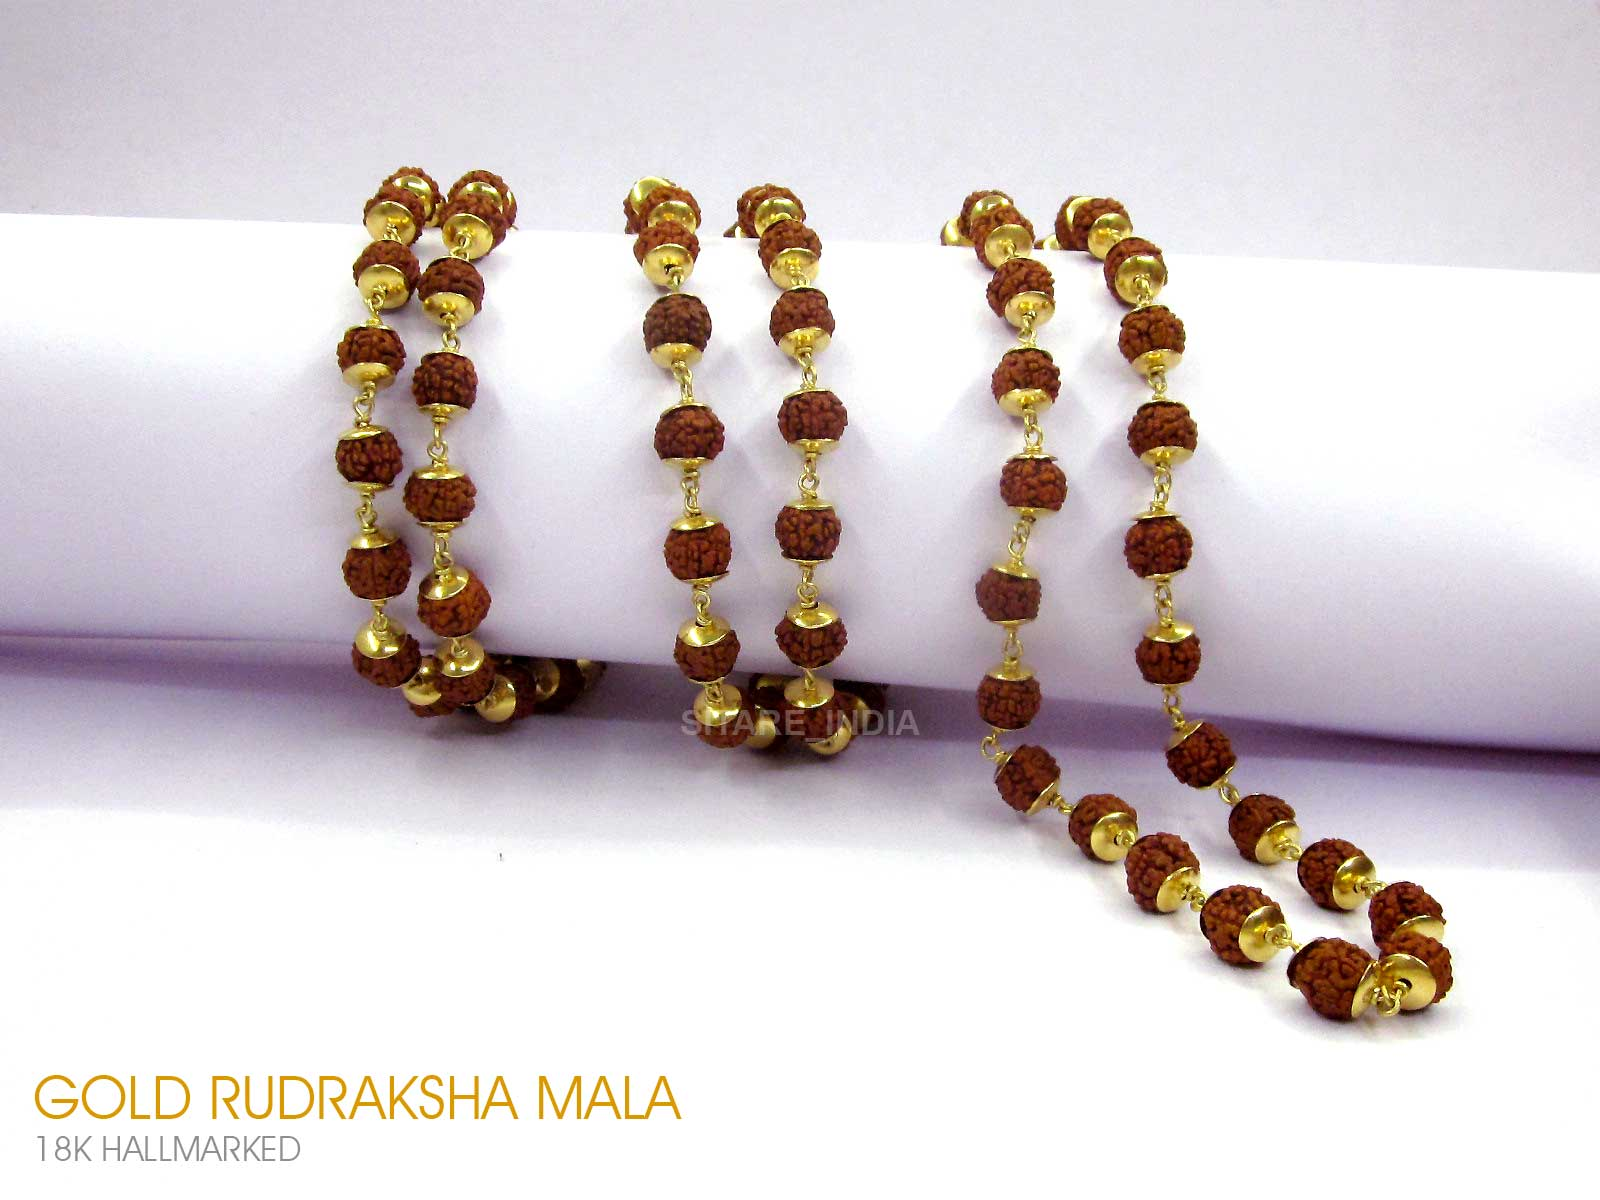 Rudraksha Dealer Siliguri Shop Supplier Bengal India